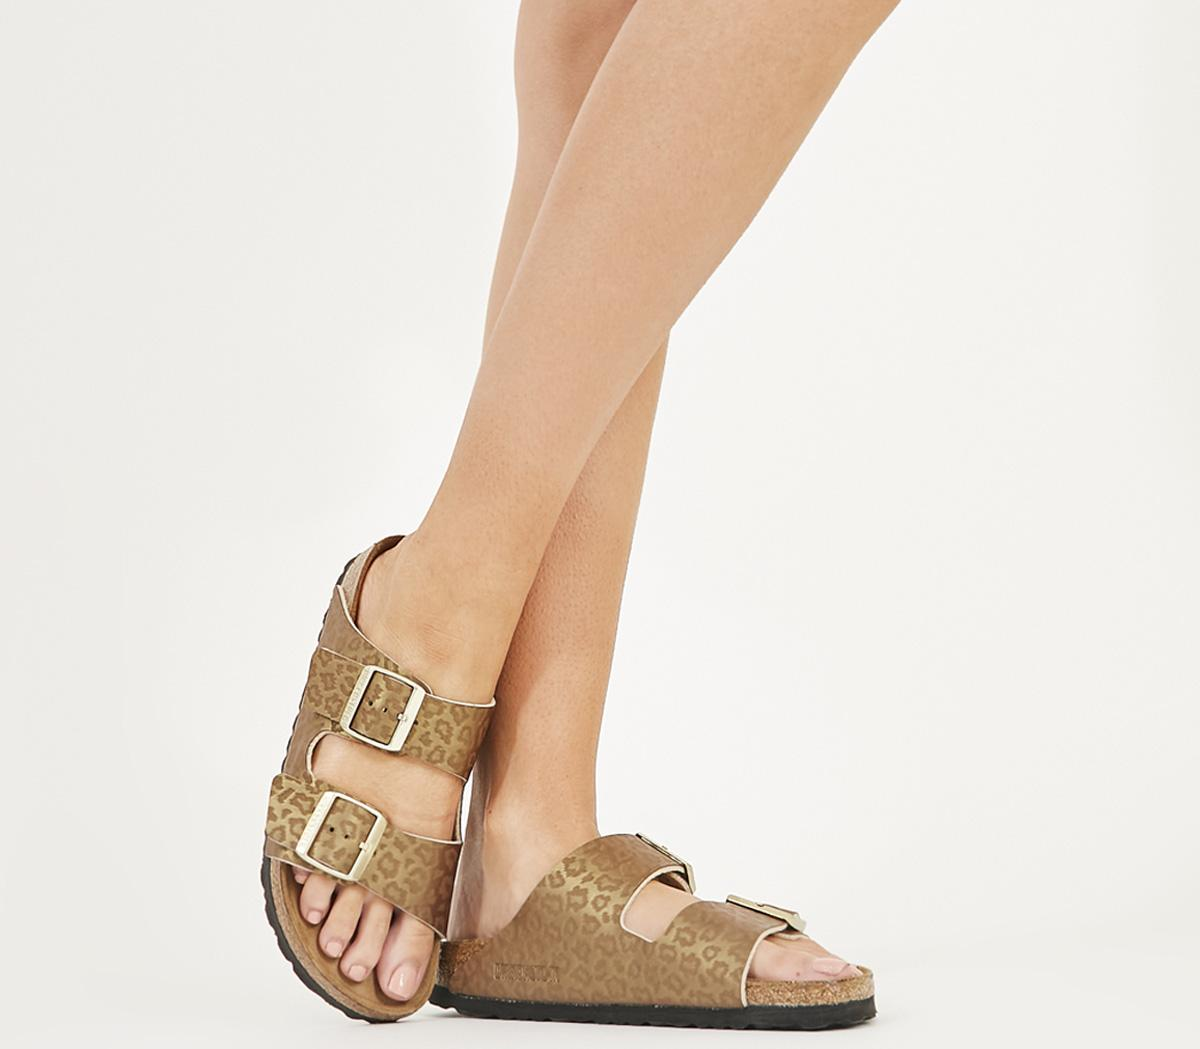 Birkenstock Arizona Two Strap Sandals Gold Leopard Sandals